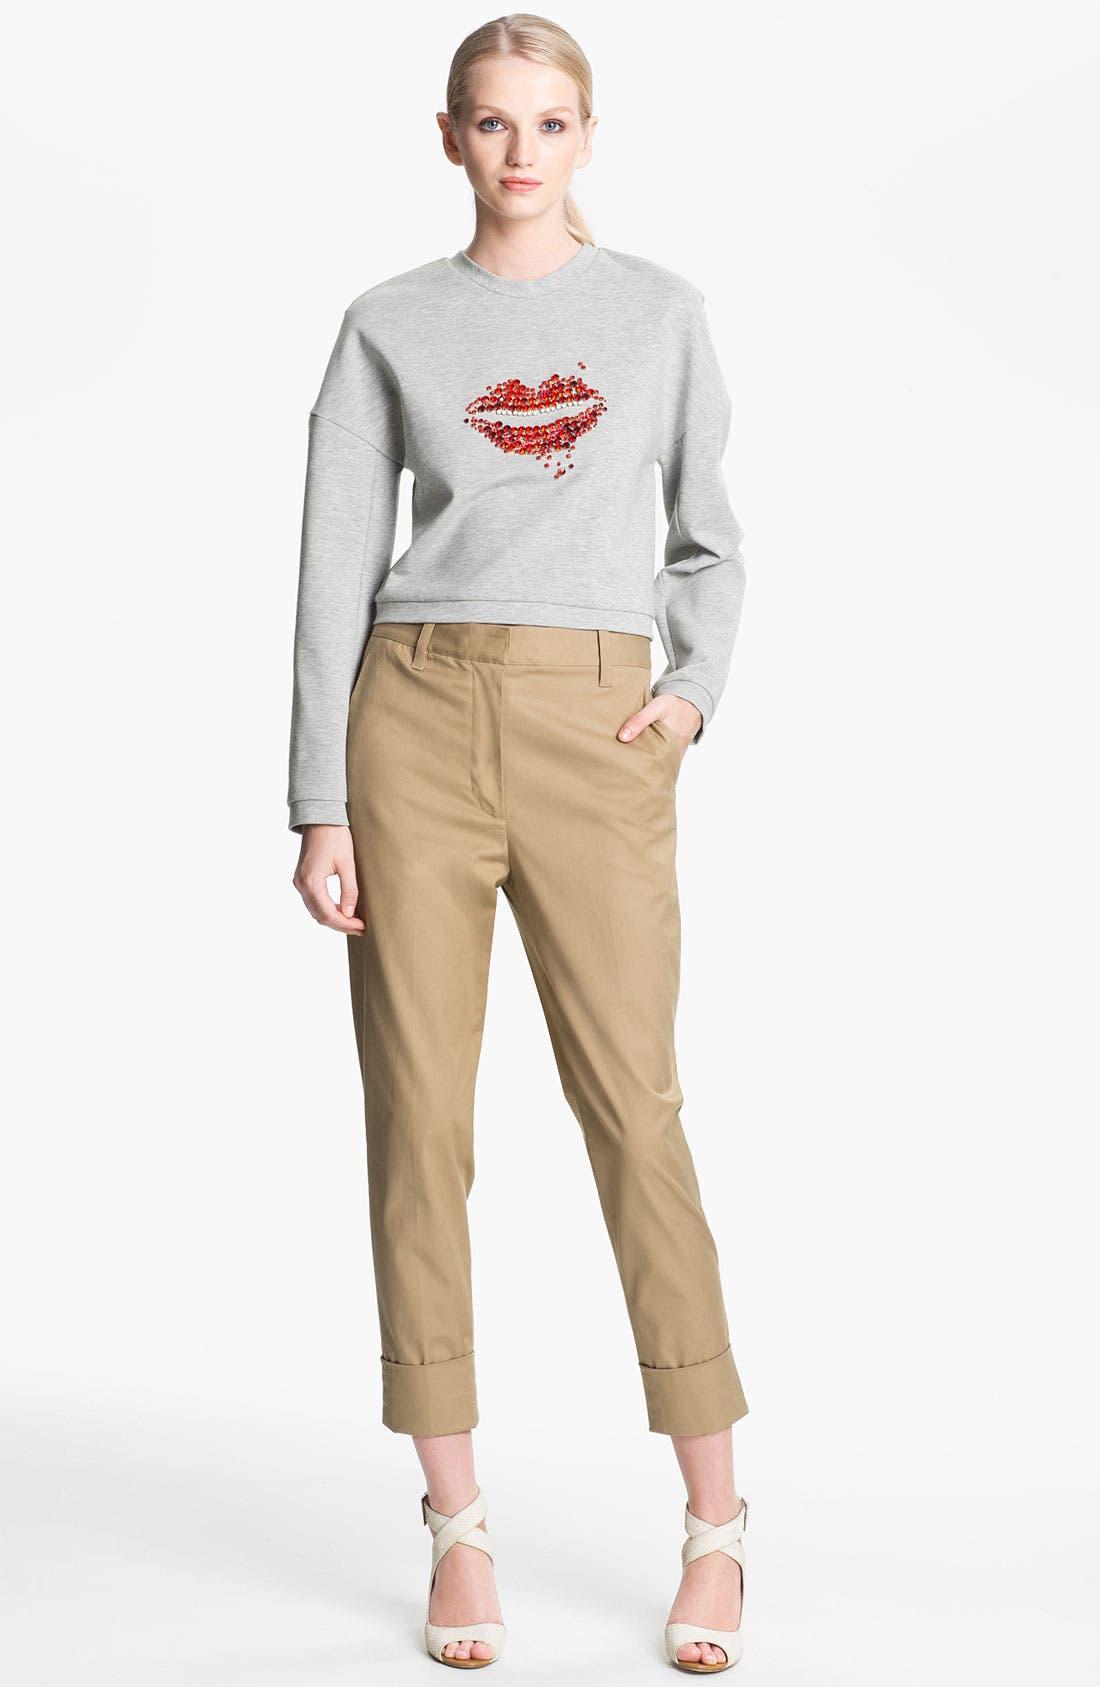 Alternate Image 1 Selected - 3.1 Phillip Lim Bead Embellished Crop Sweatshirt